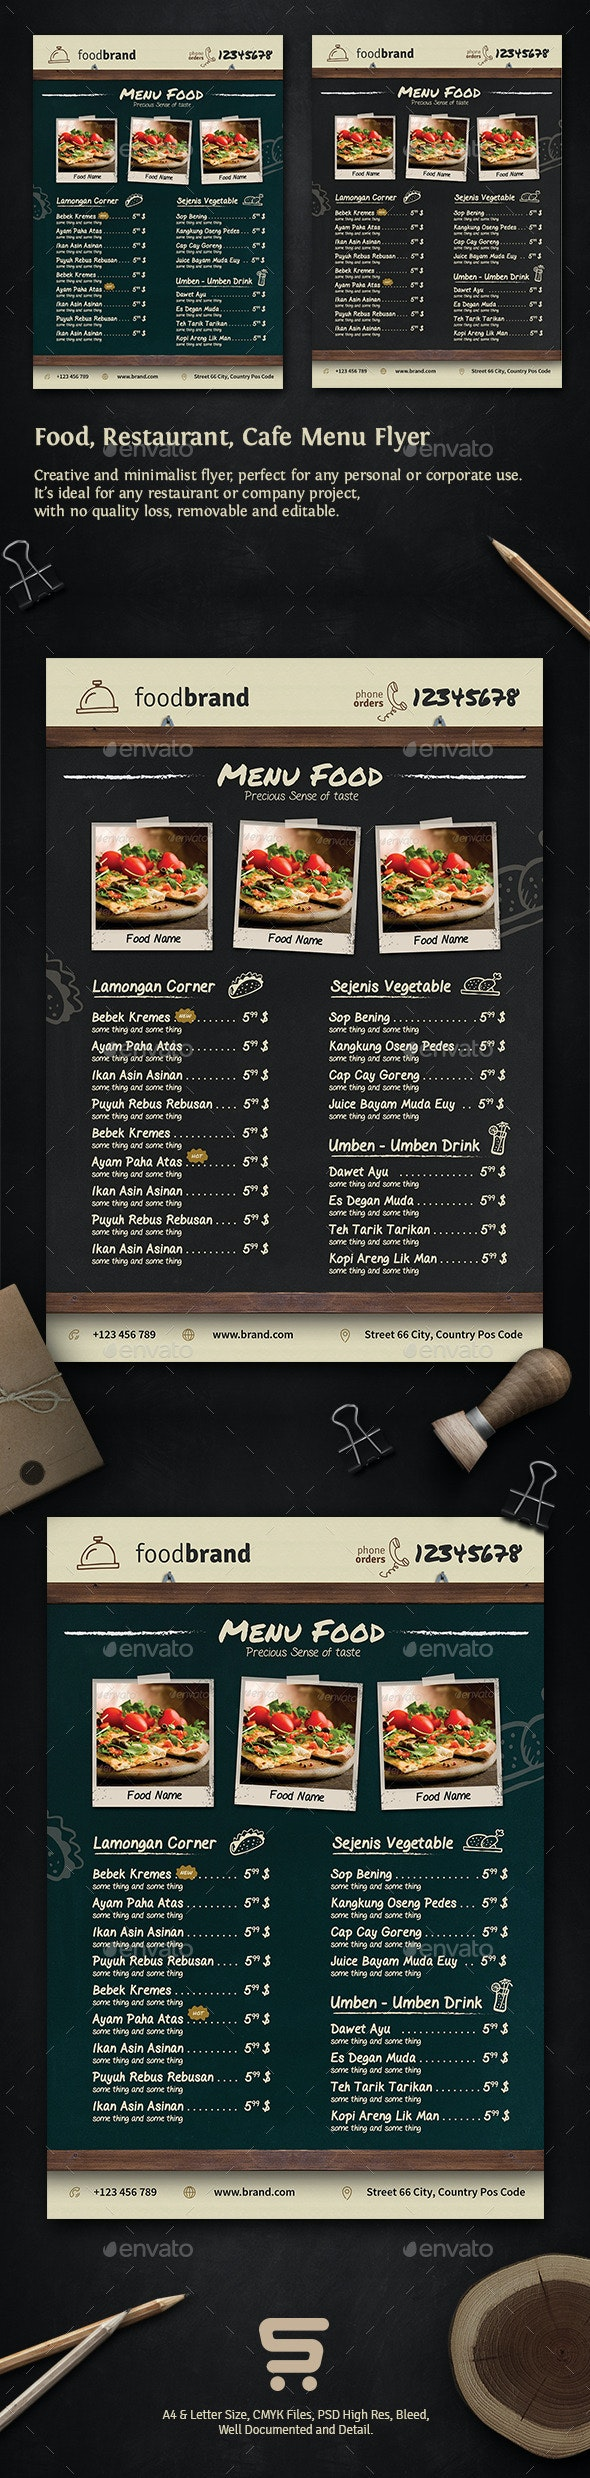 Food-Restaurant-Cafe-Menu Flyer - Restaurant Flyers